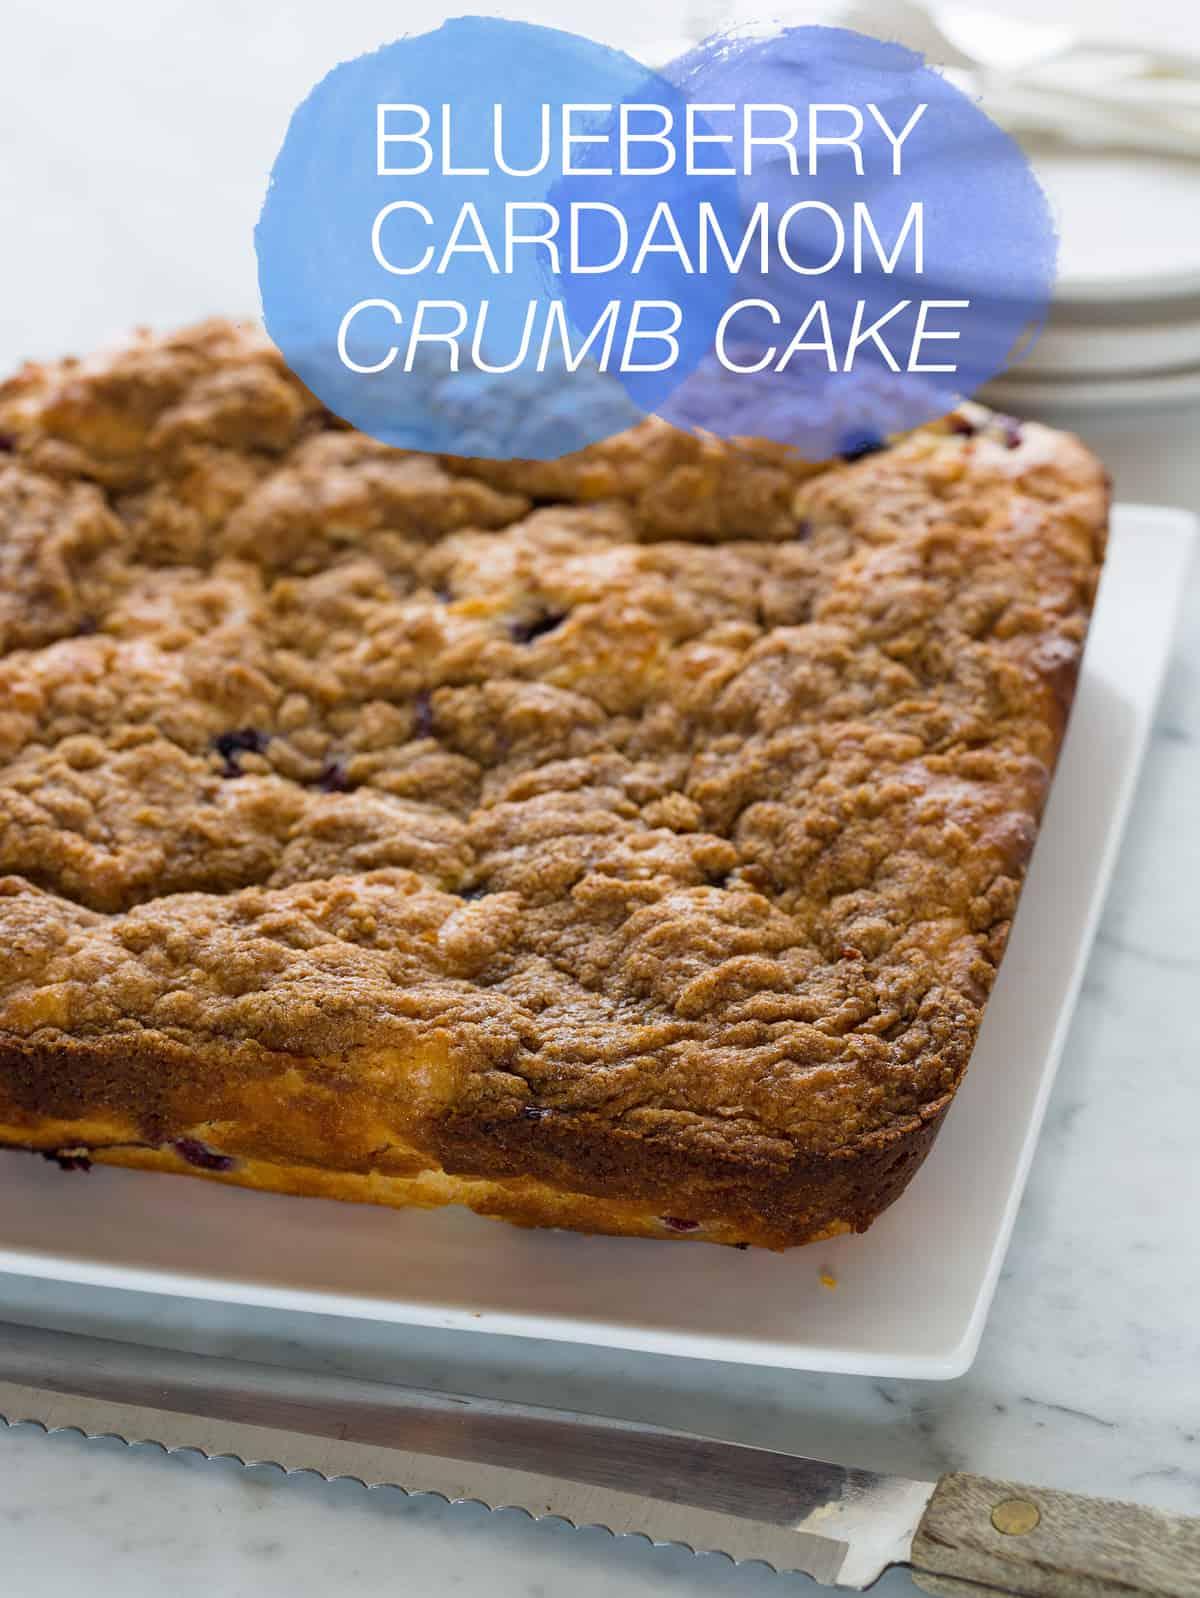 Blueberry Cardamom Crumb Cake recipe | Spoon Fork Bacon